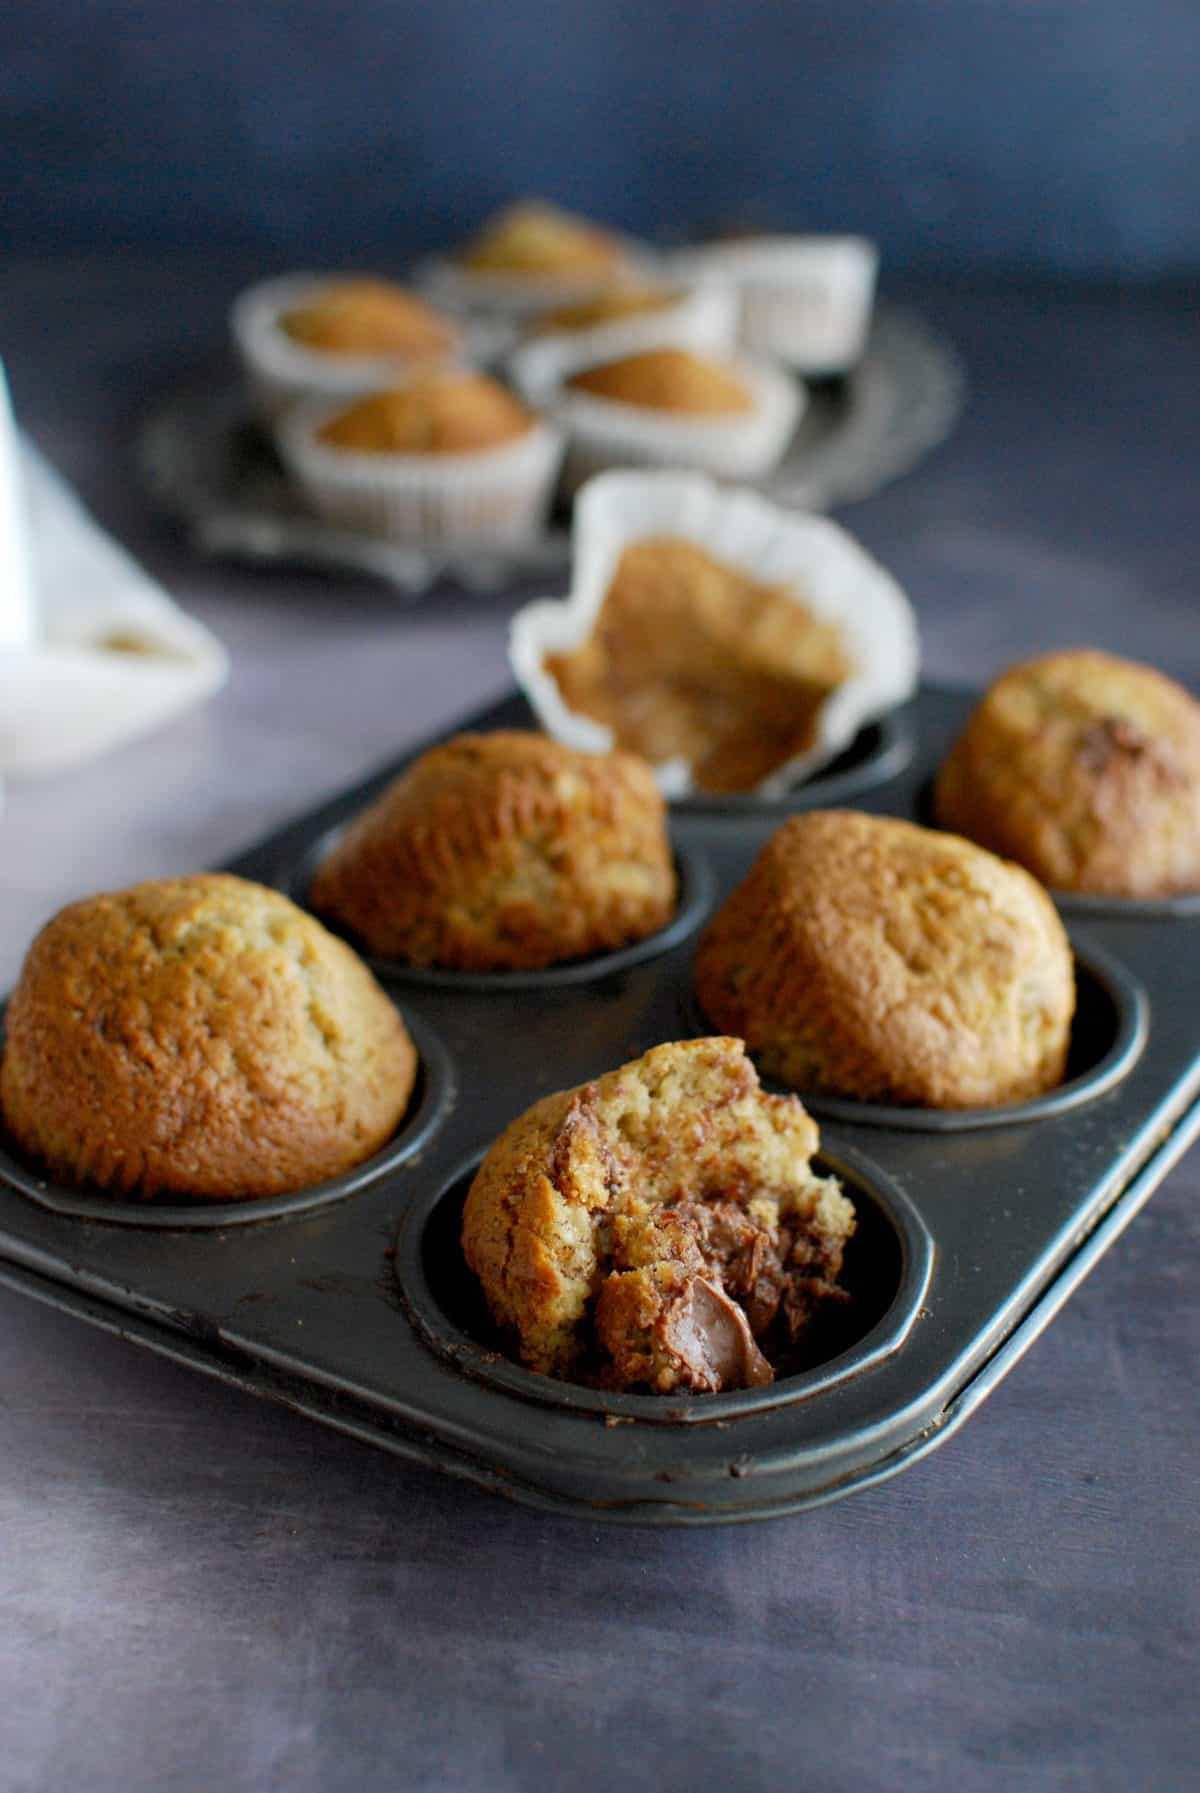 banana praline muffins, μαφινς με μπανάνα νουτέλα πραλίνα